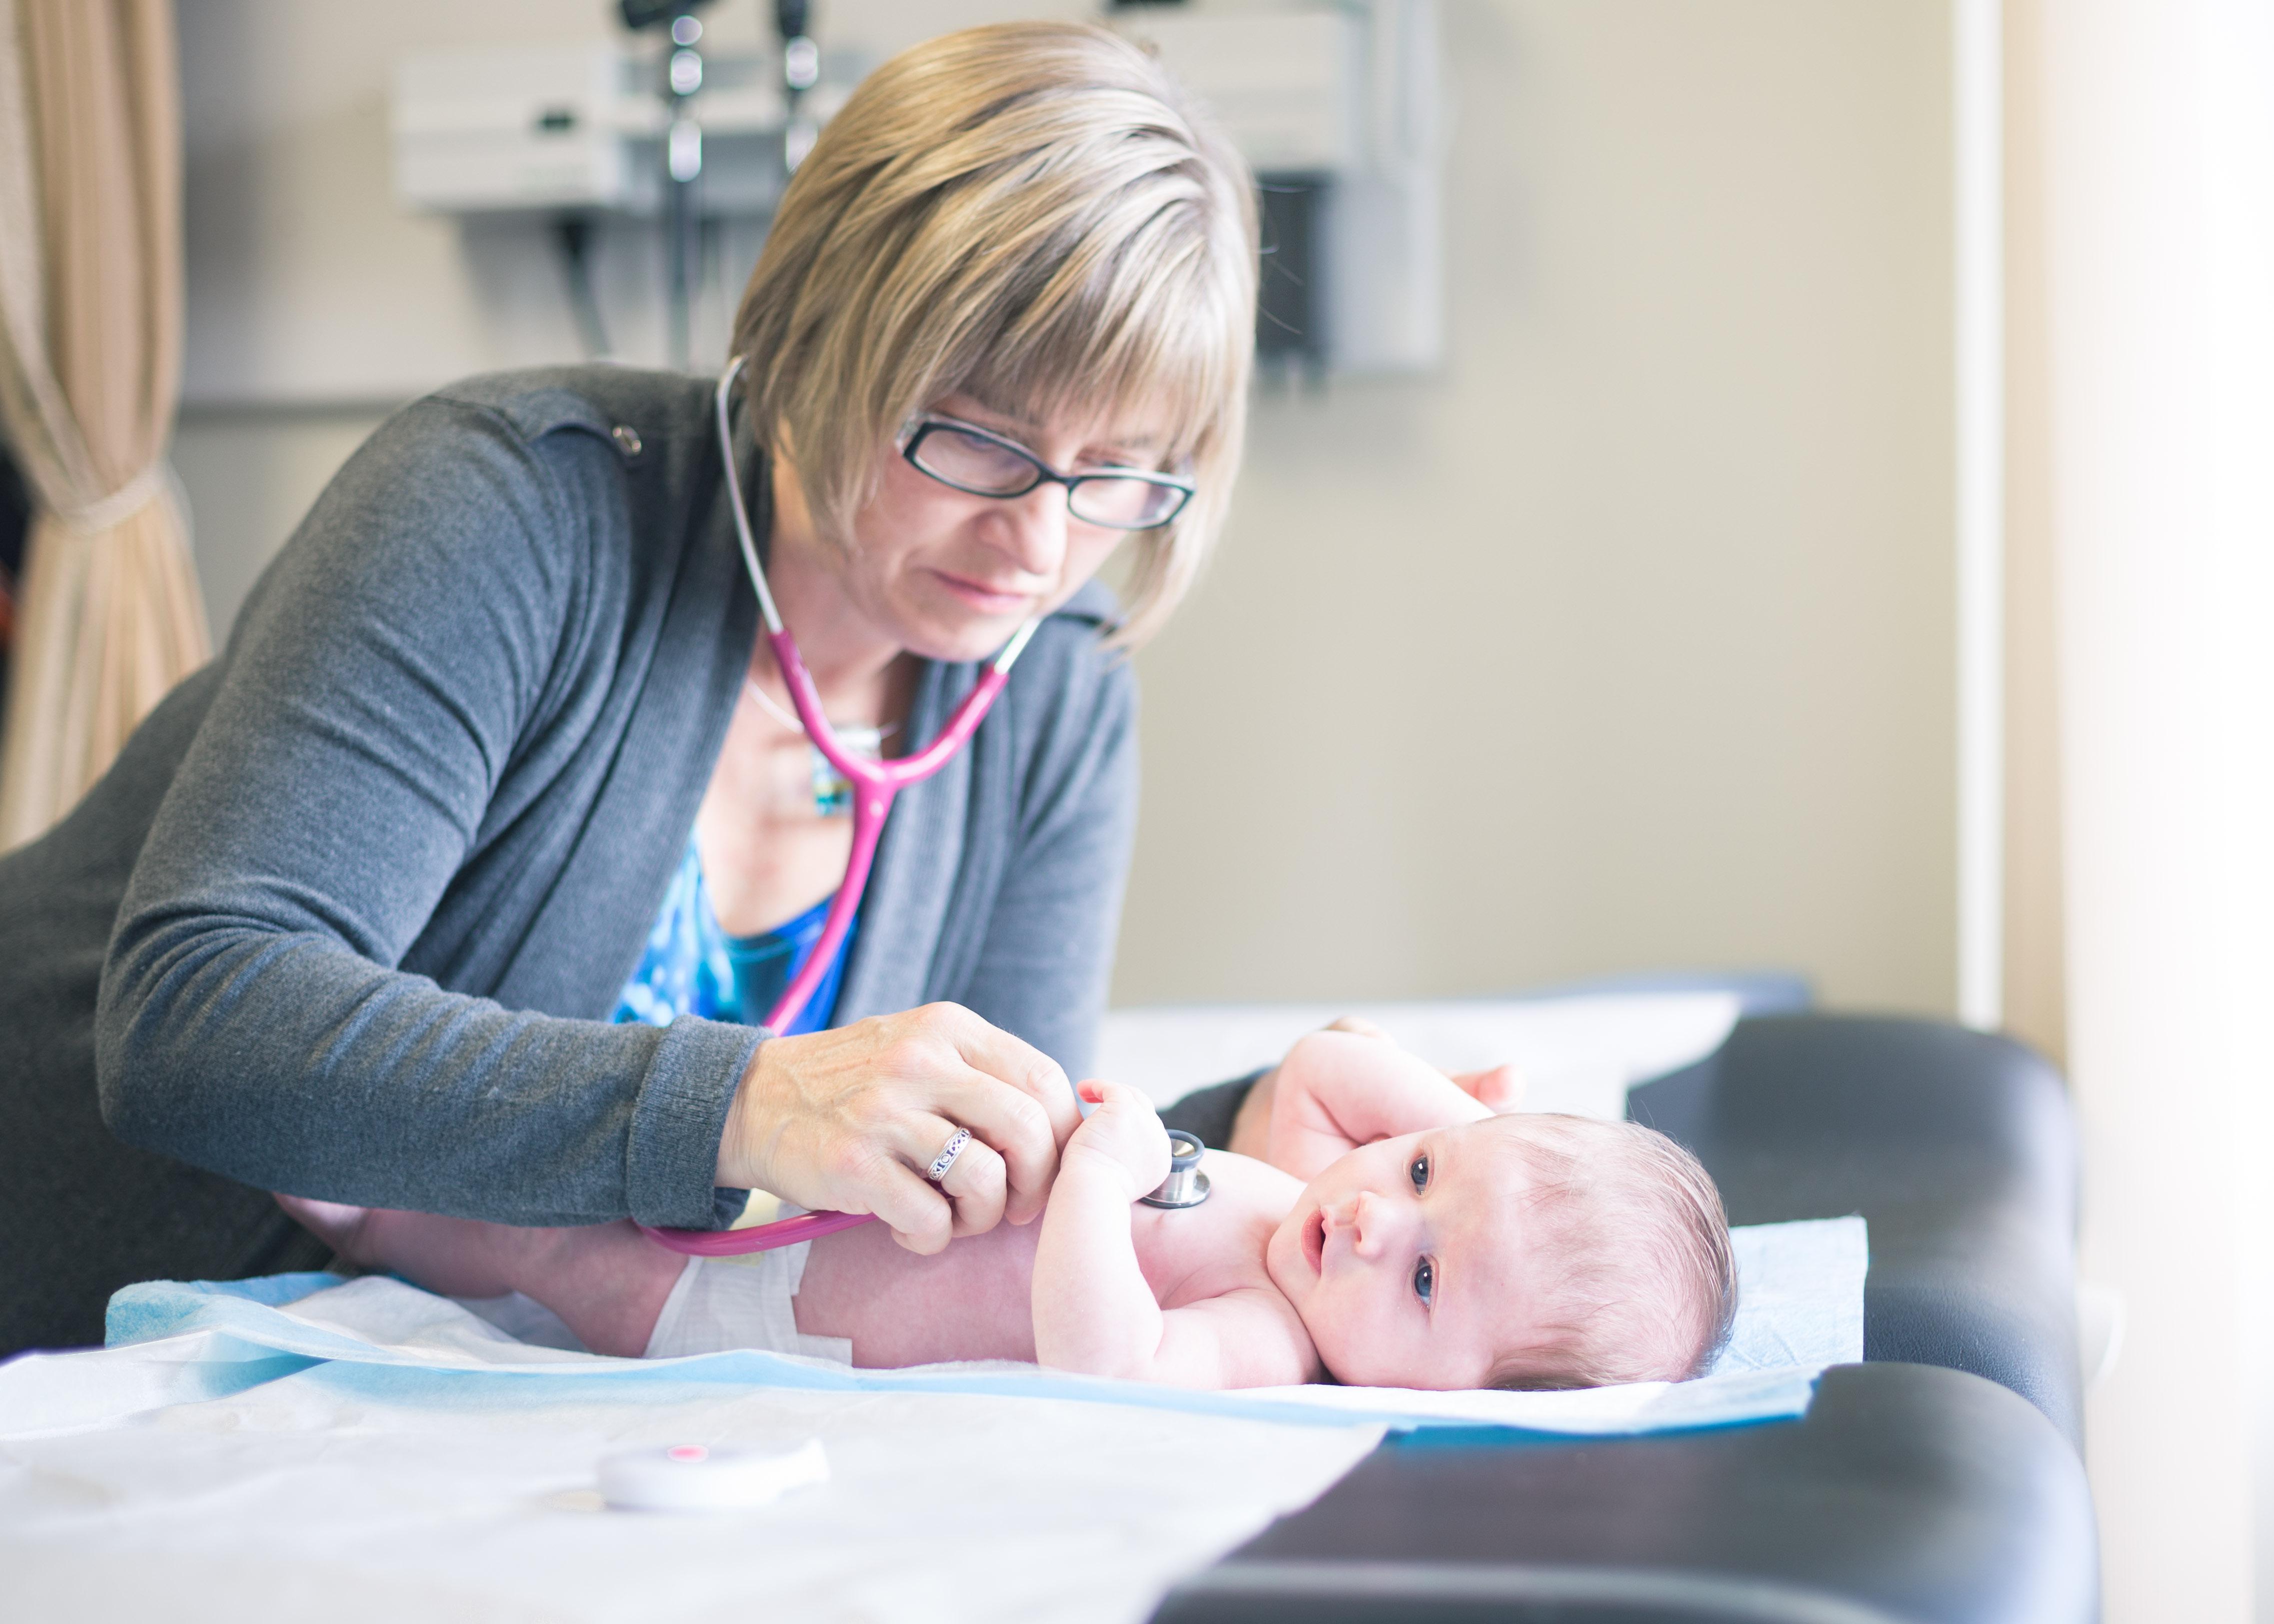 Cowichan Maternity Clinic